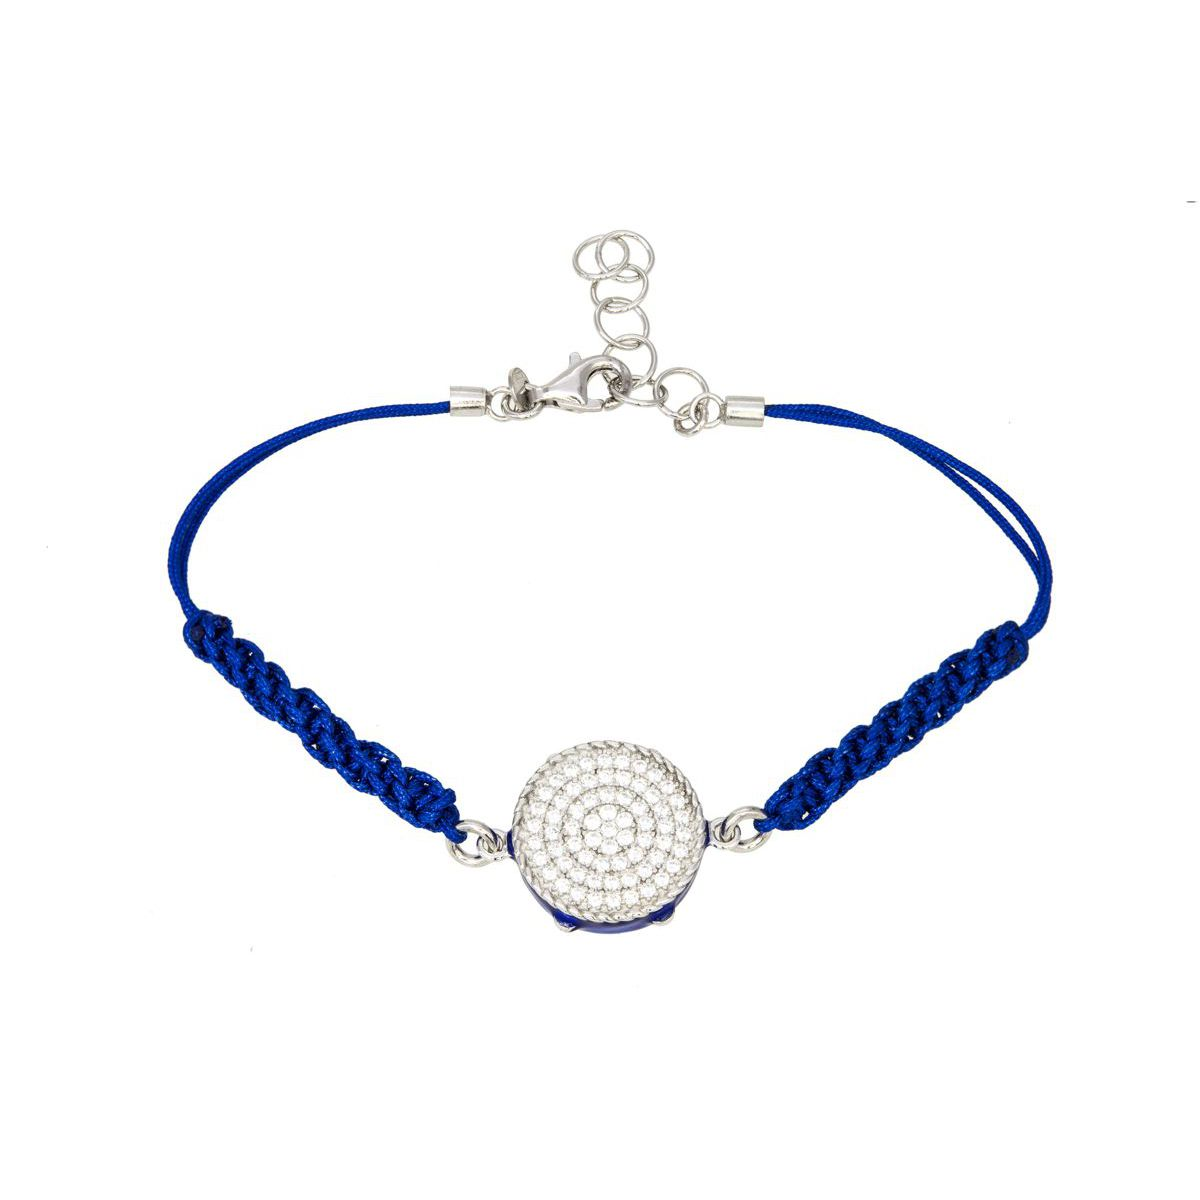 TAMBURINE MACRAME BRACELET Blue M'AMI SICILY JEWELS